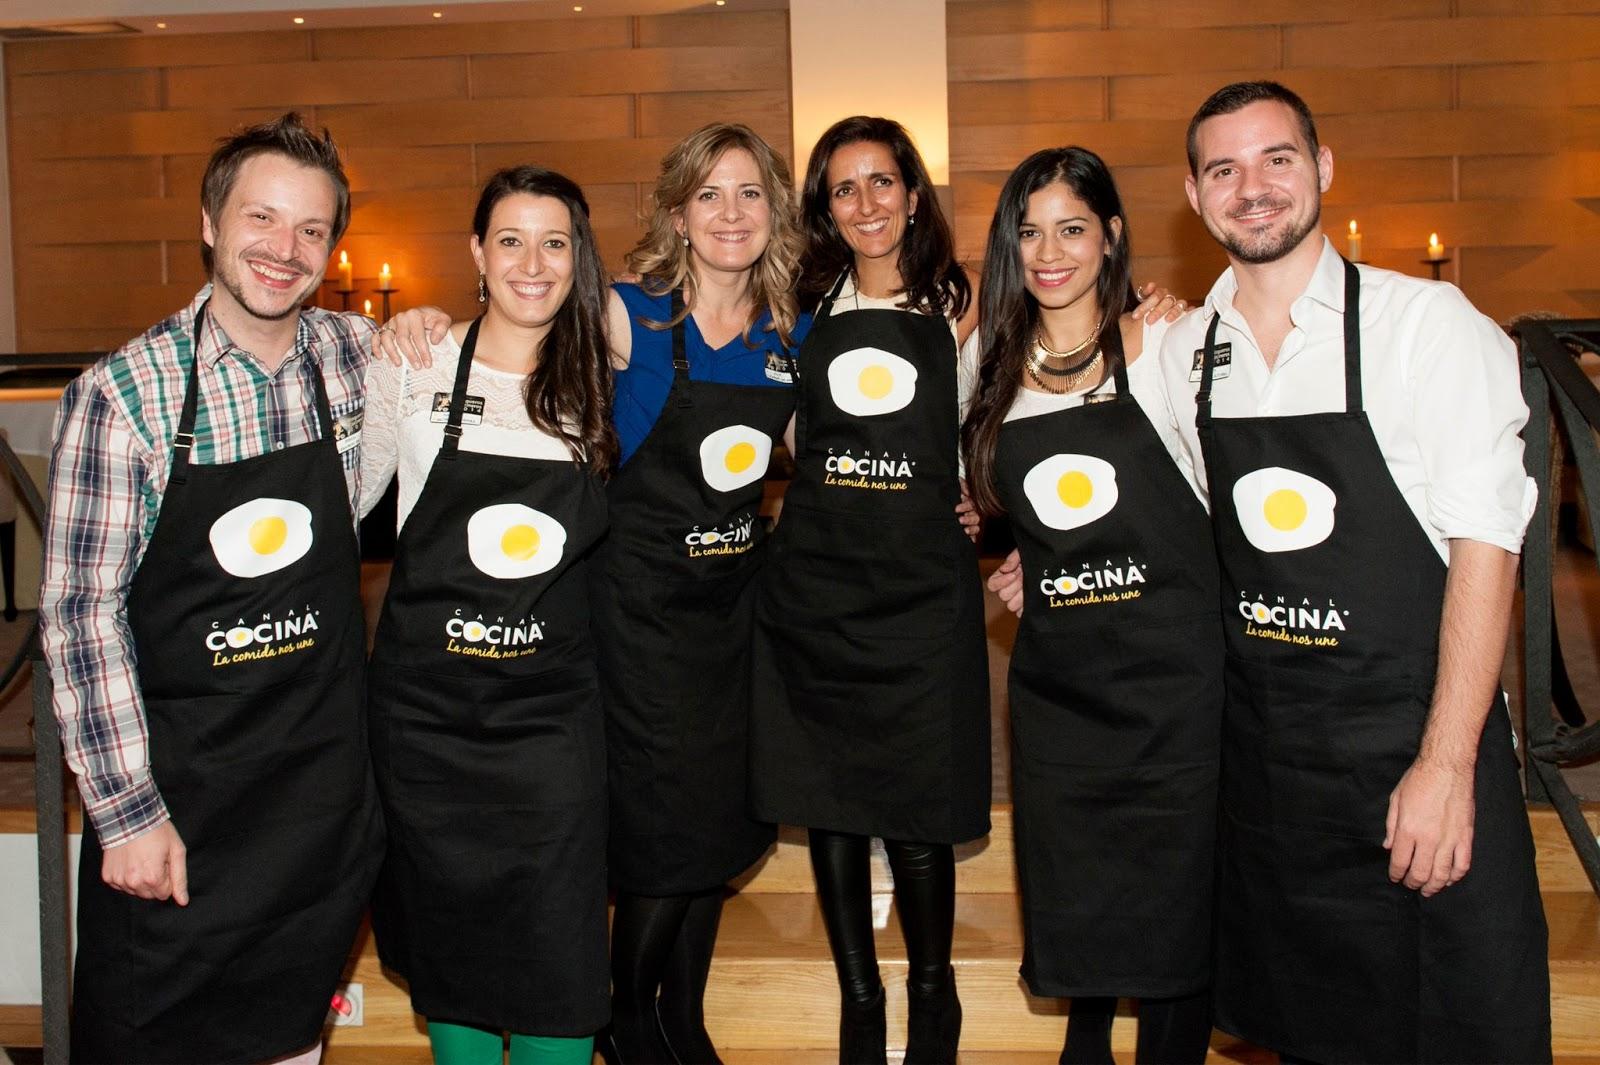 Ganadores blogueros cocineros 2014. Canal Cocina. Chef Orielo